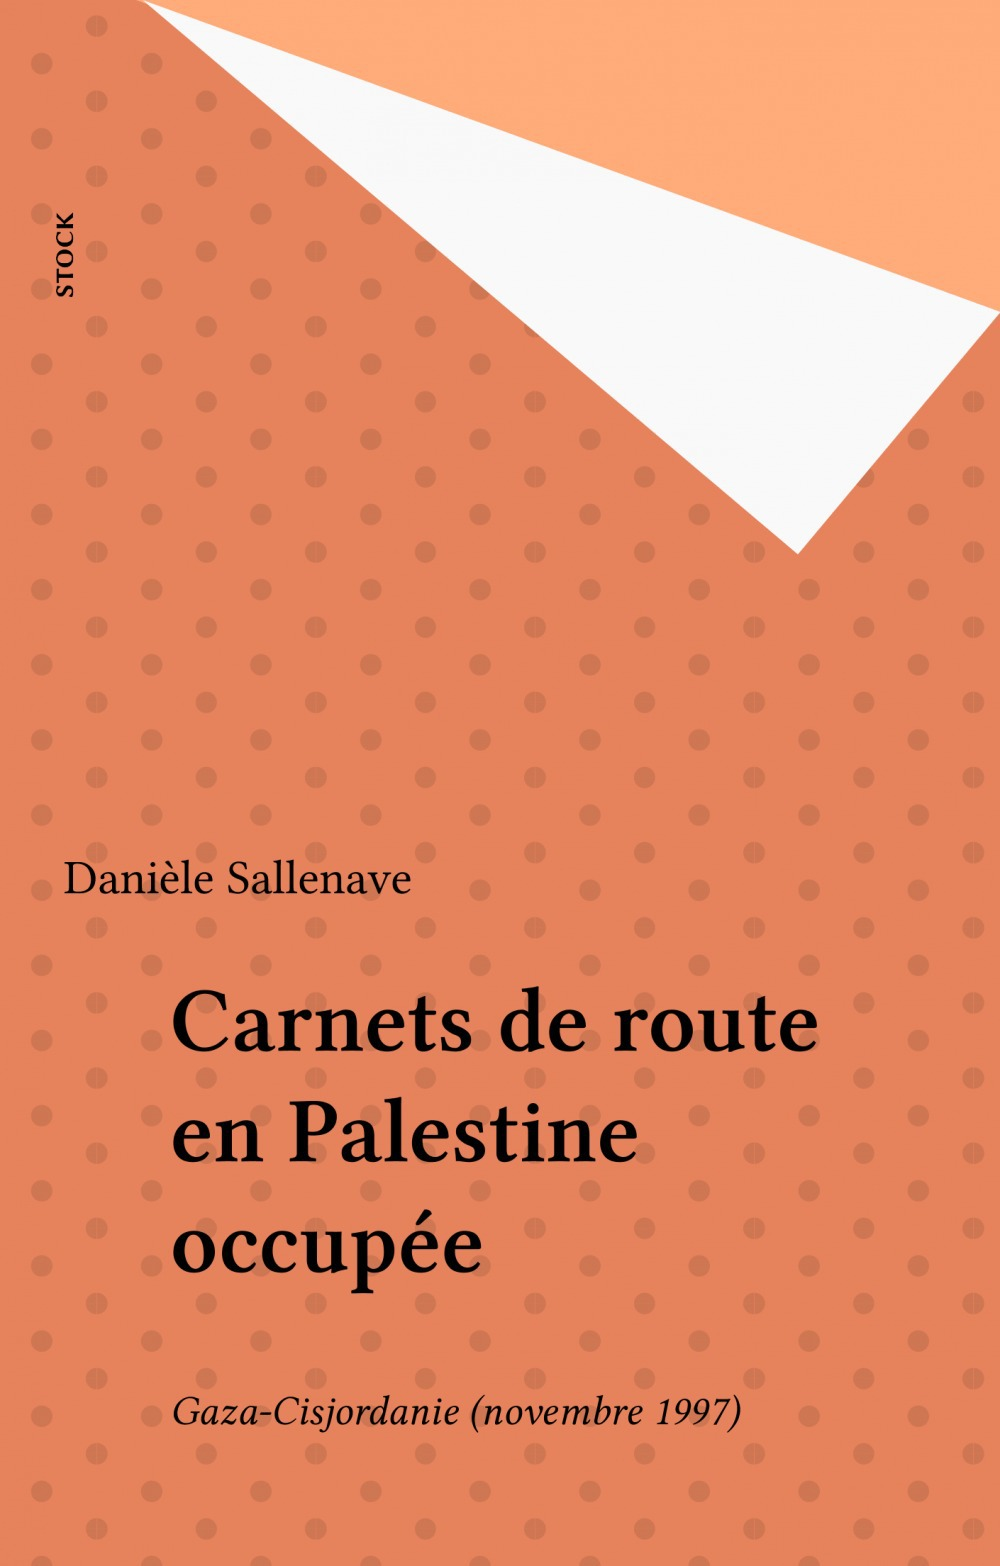 Carnets de route en palestine occupee: gaza-jordanie, nov.97